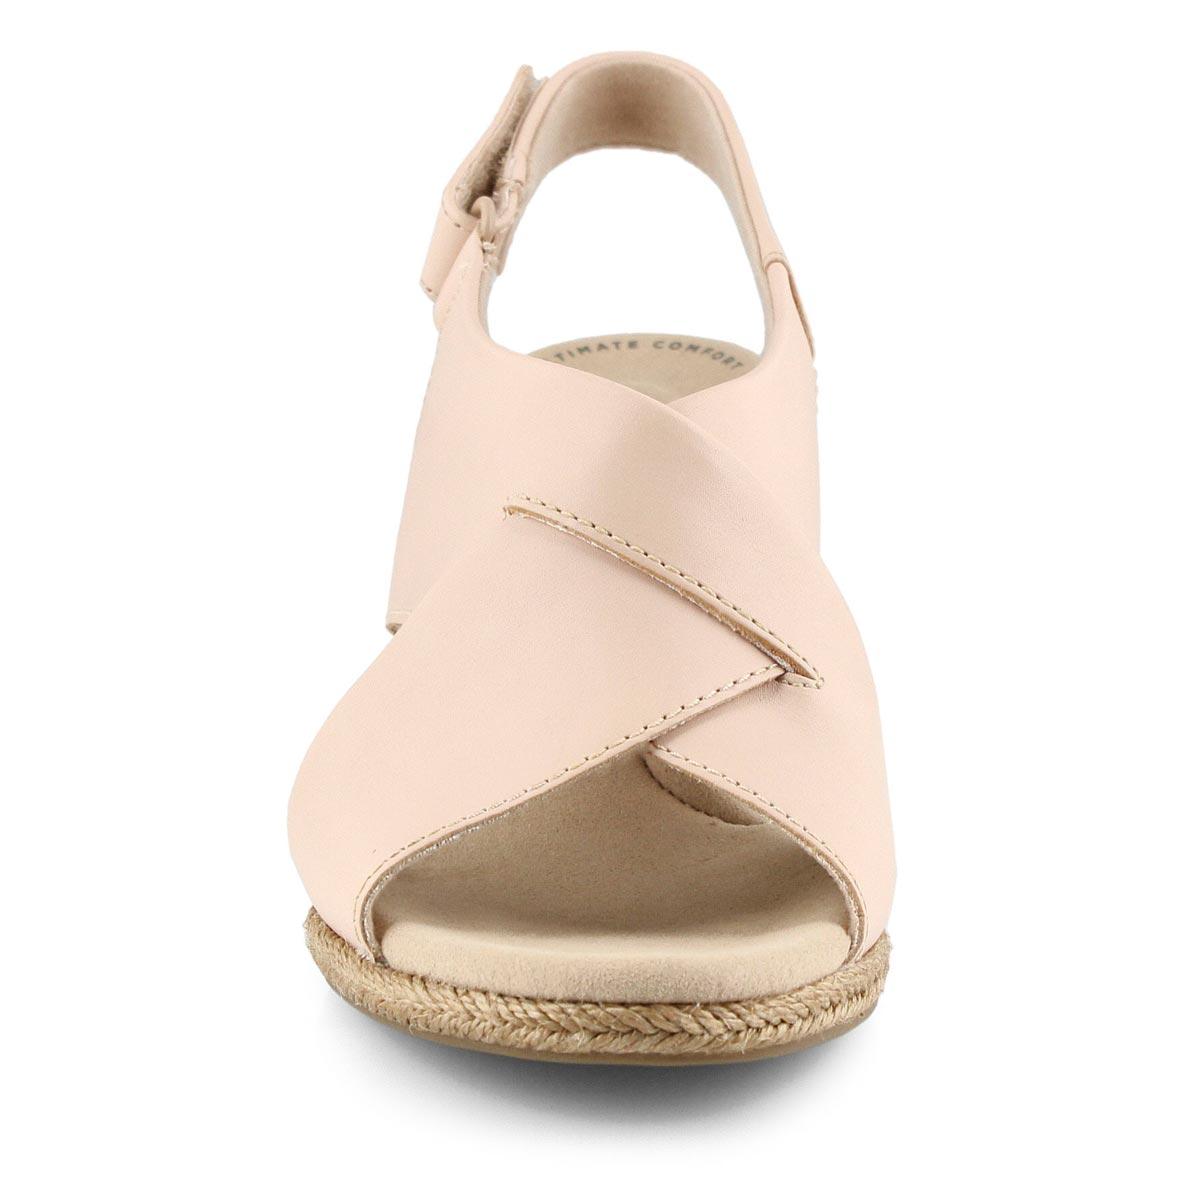 Lds Lafley Alaine blush wedge sandal